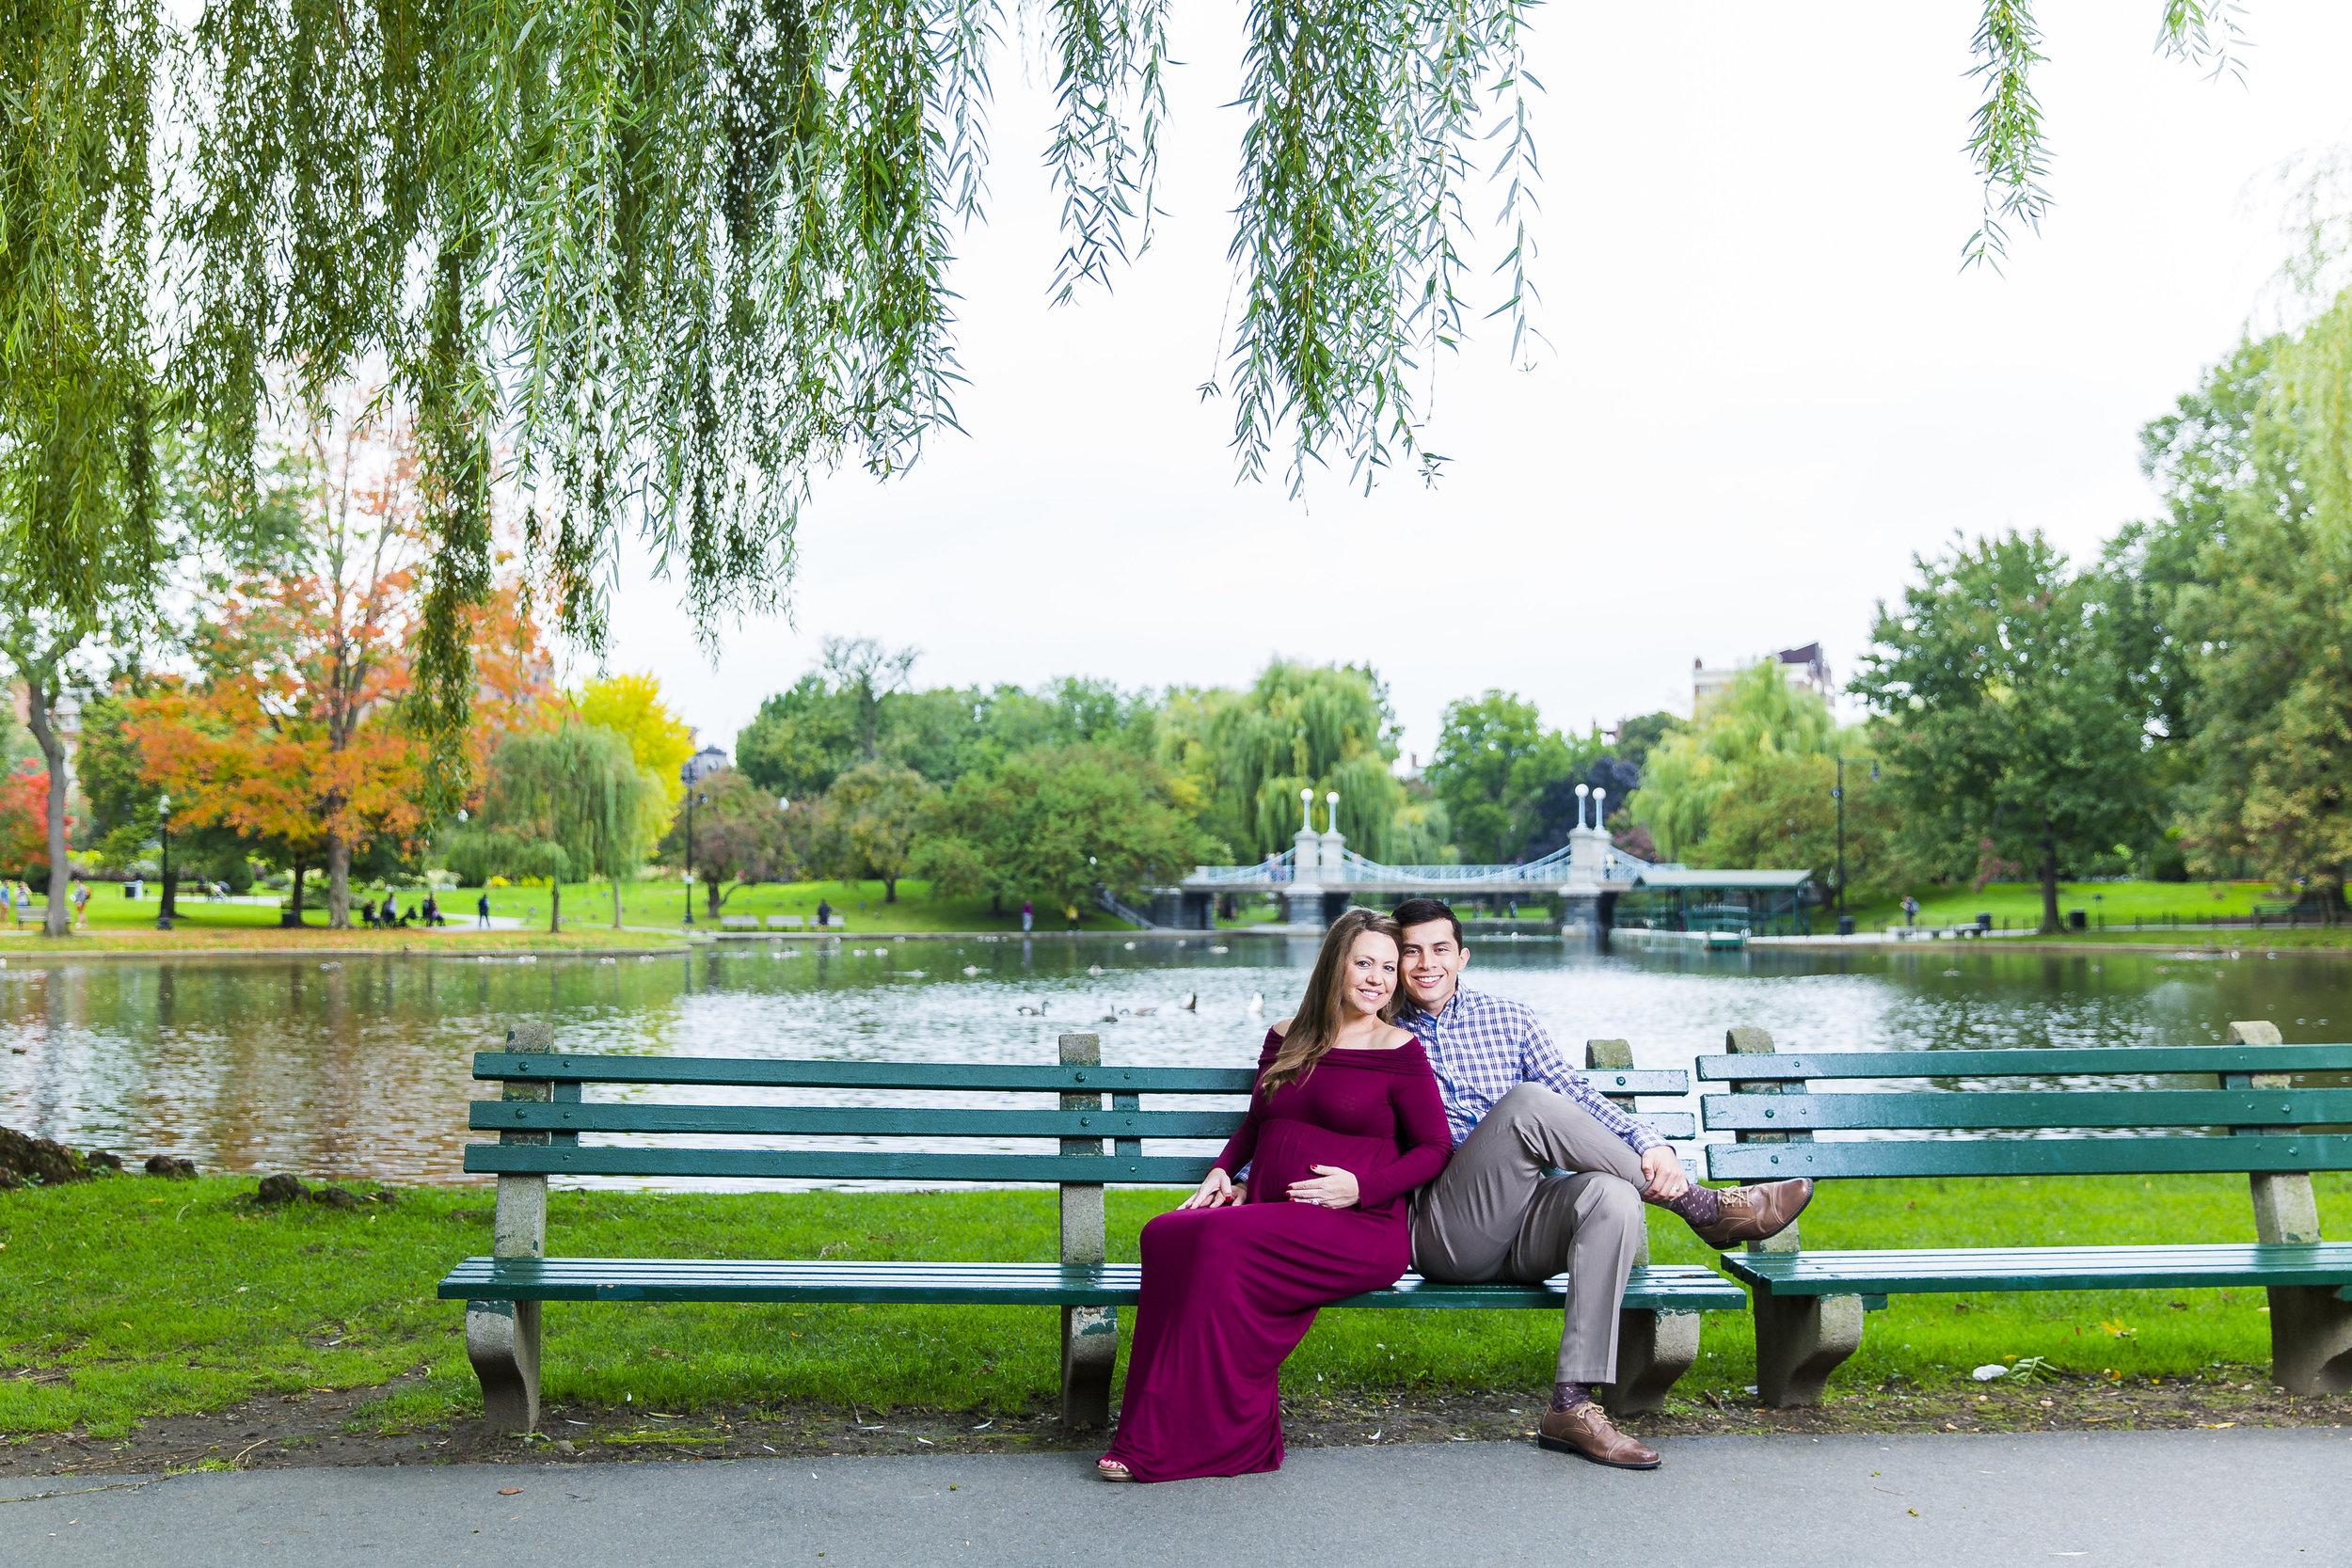 314A4956 Giovanni The Photographer Best Boston Maternity New Born Photography Public Garden - Common.jpg